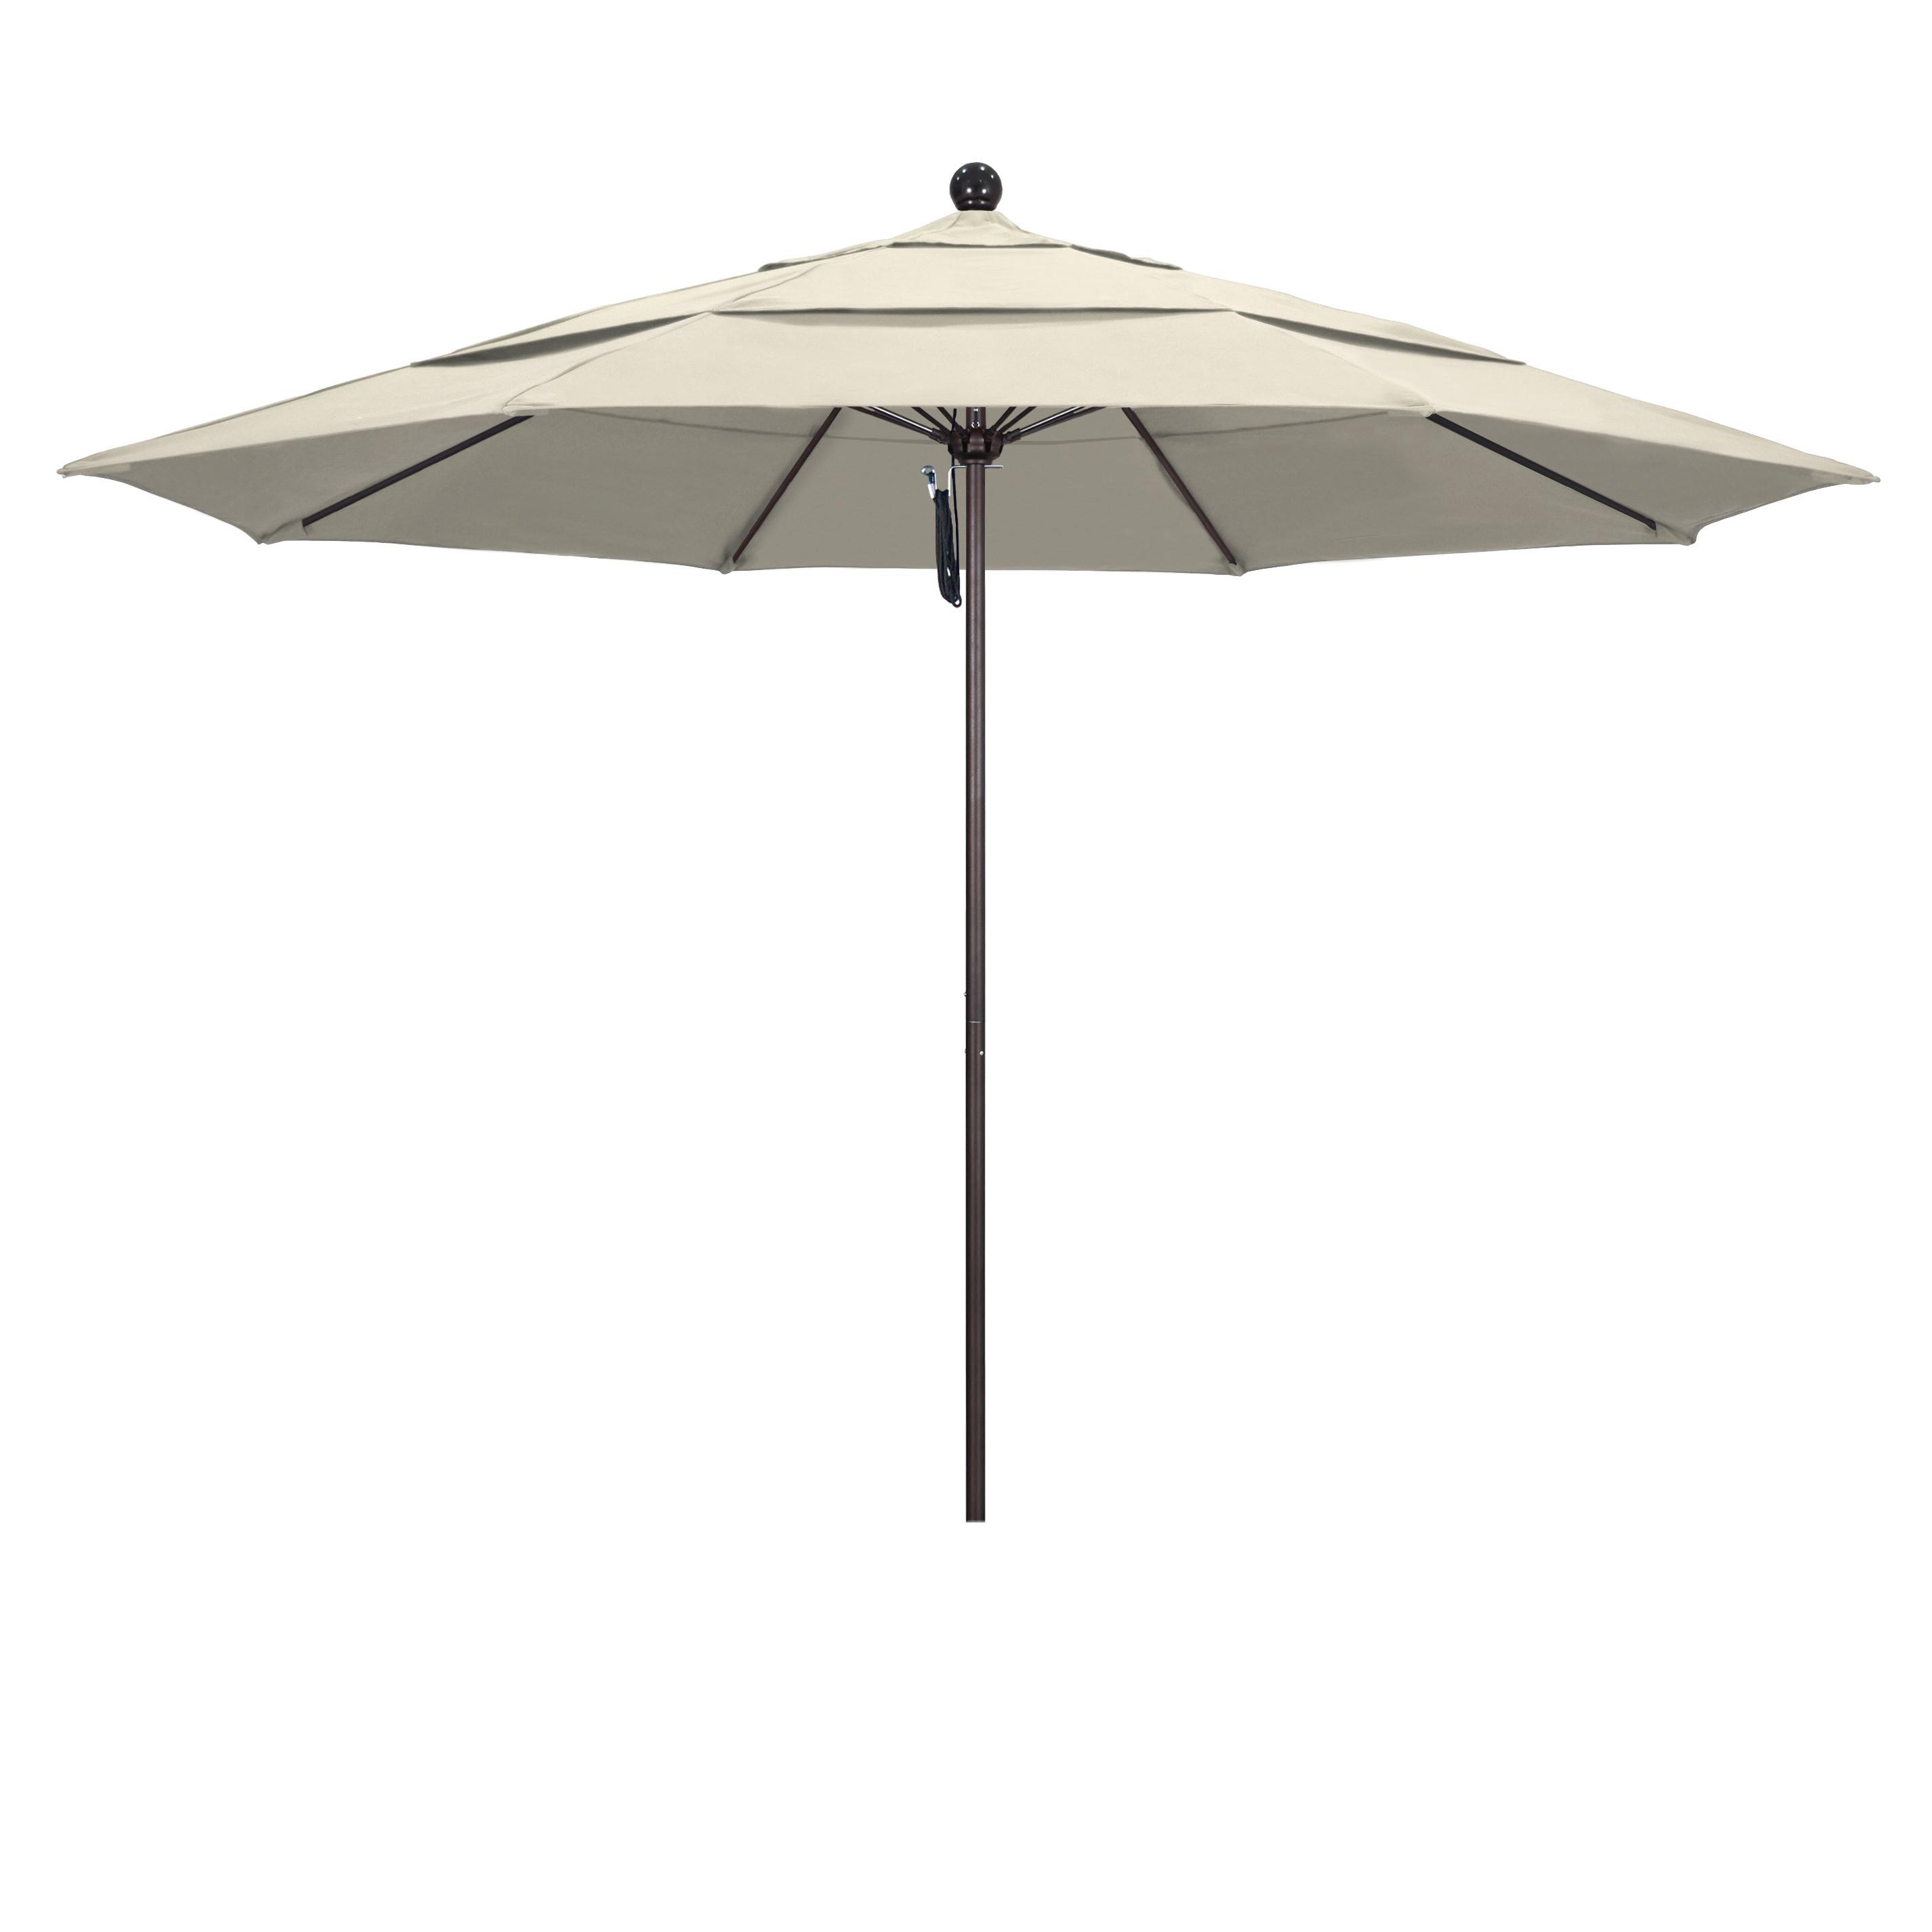 Trendy Duxbury 11' Market Umbrella Regarding Mraz Market Umbrellas (View 19 of 20)